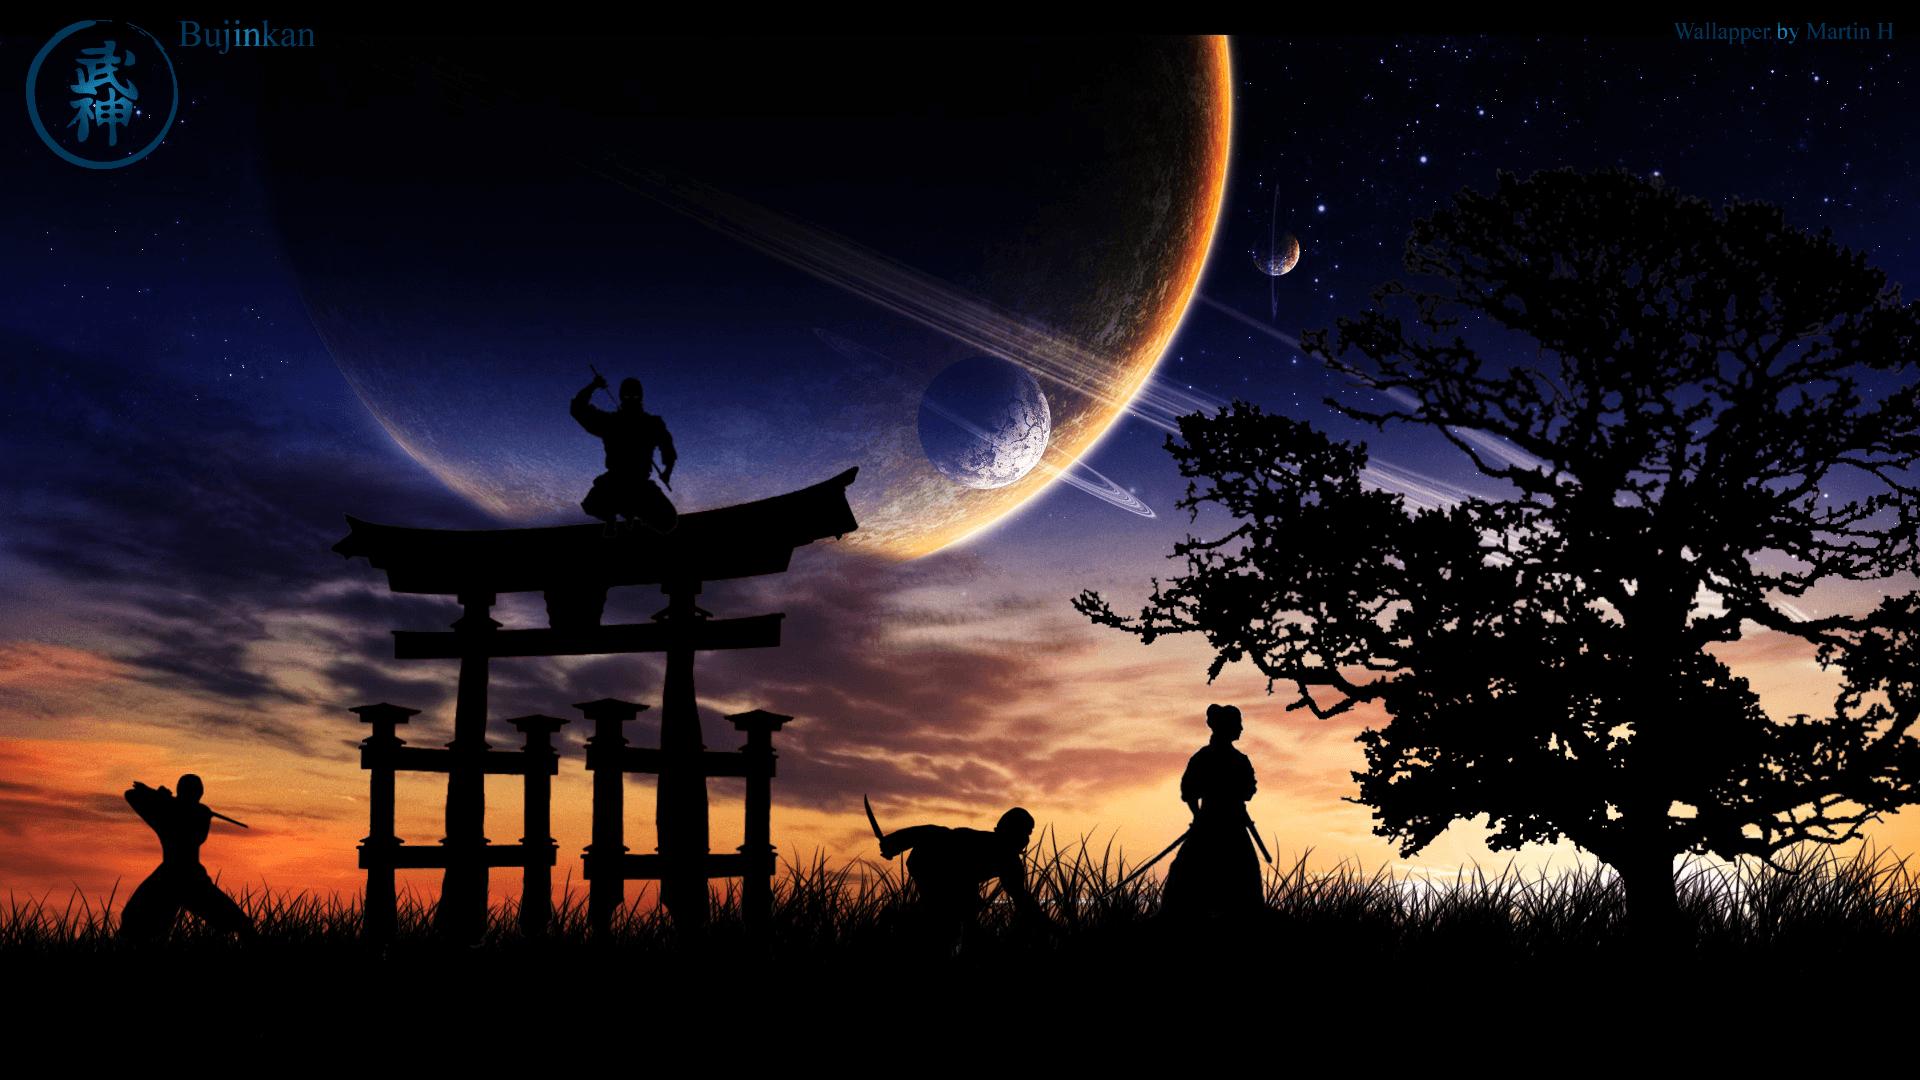 Japanese Ninja Wallpapers   Top Japanese Ninja Backgrounds 1920x1080